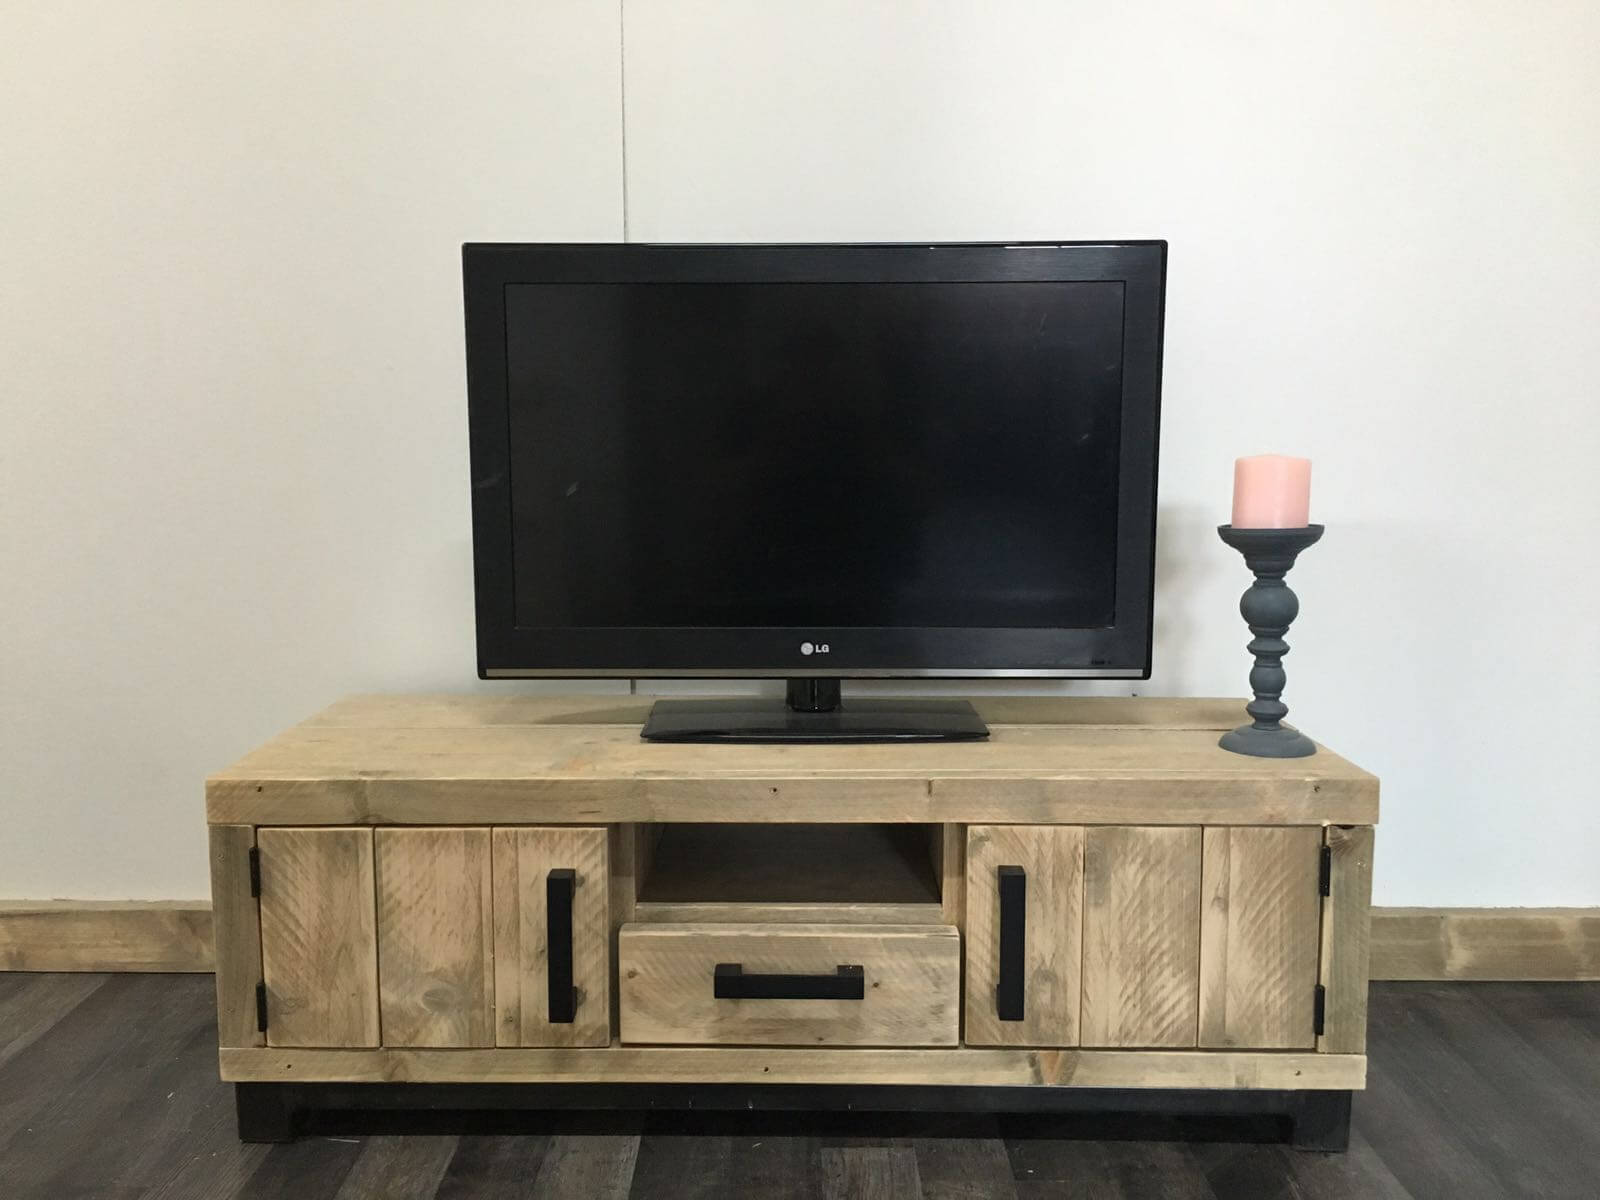 Steigerhouten tv meubel hollis steigerhouttrend for Kast voor tv